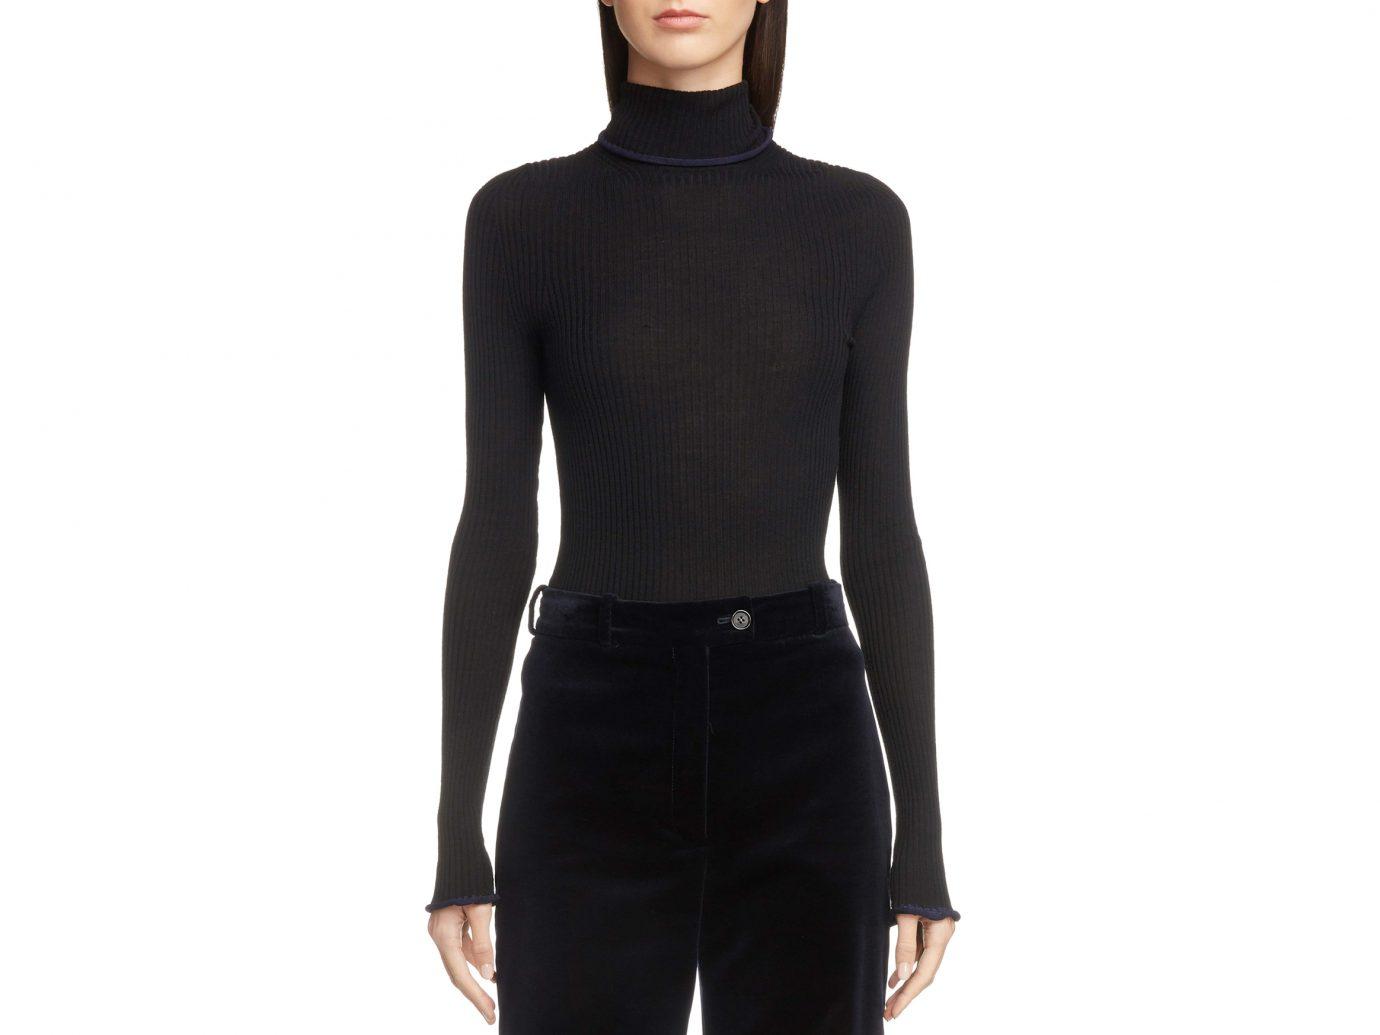 ACNE STUDIOS Ribbed Wool Turtleneck Sweater